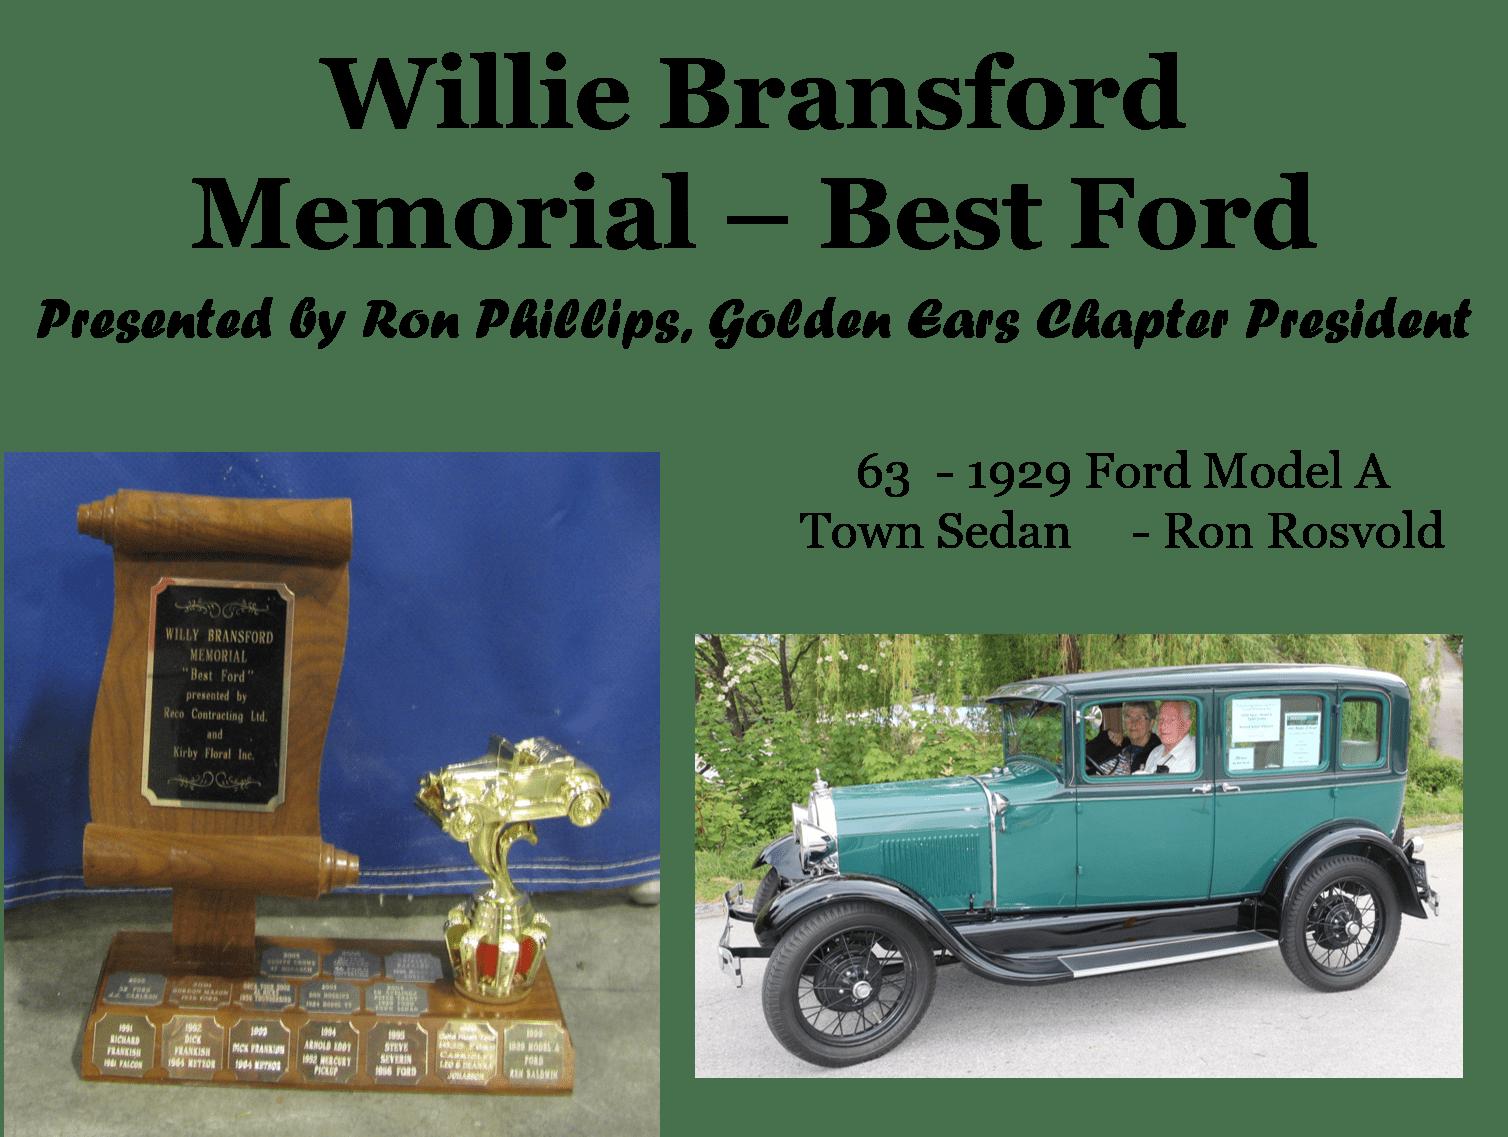 Willie Bransford Memorial - Best Ford